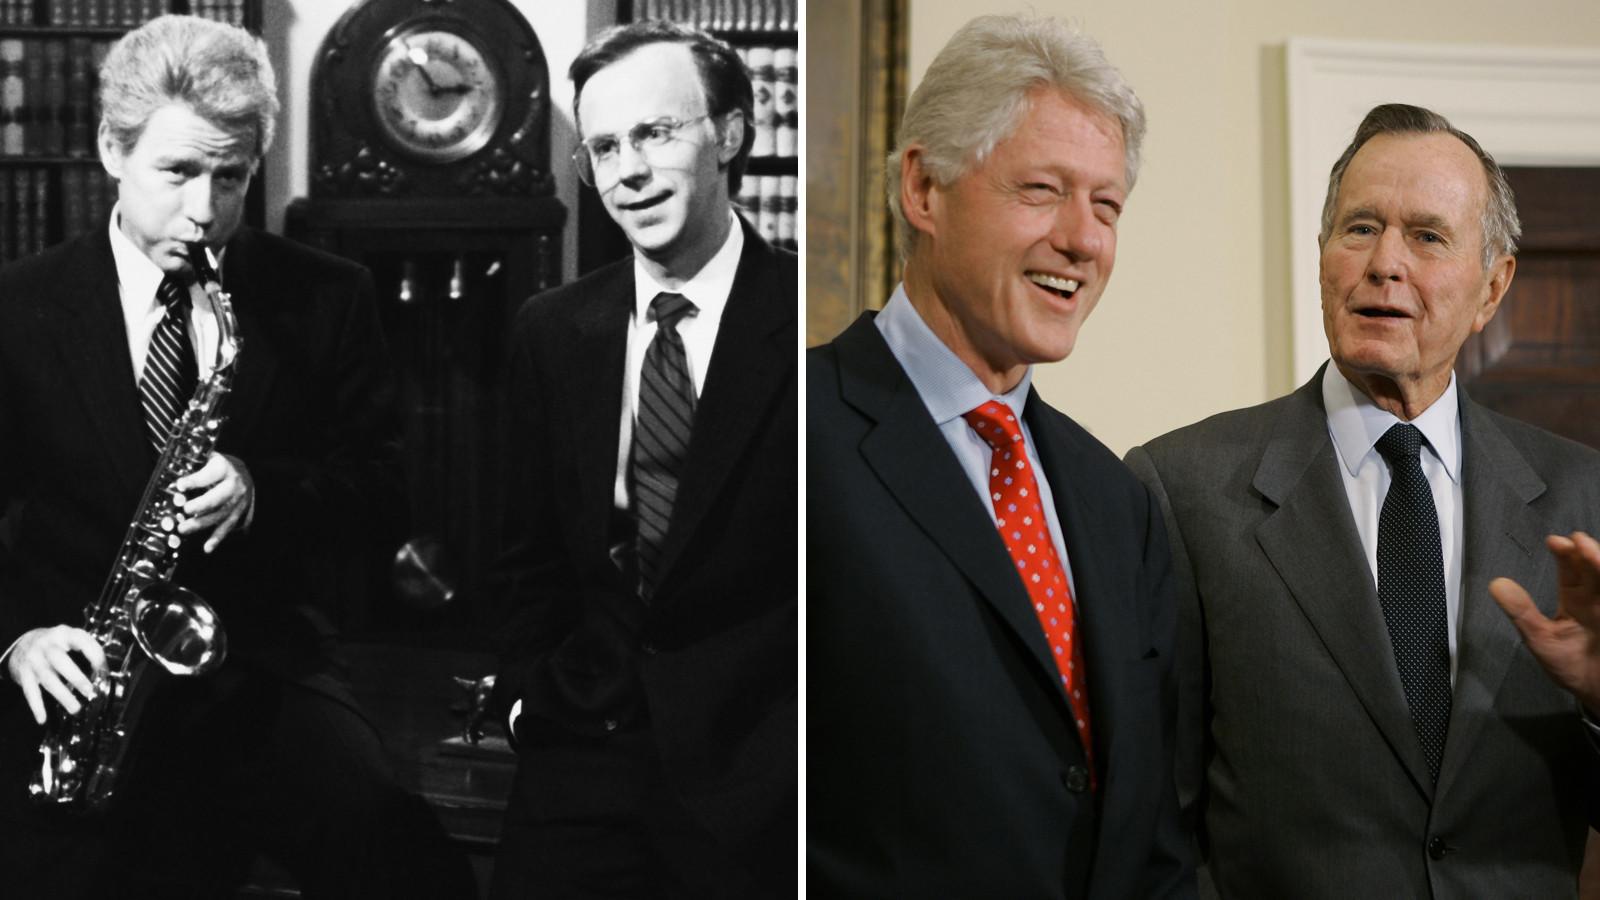 Hartman, Carvey, Clinton, Bush